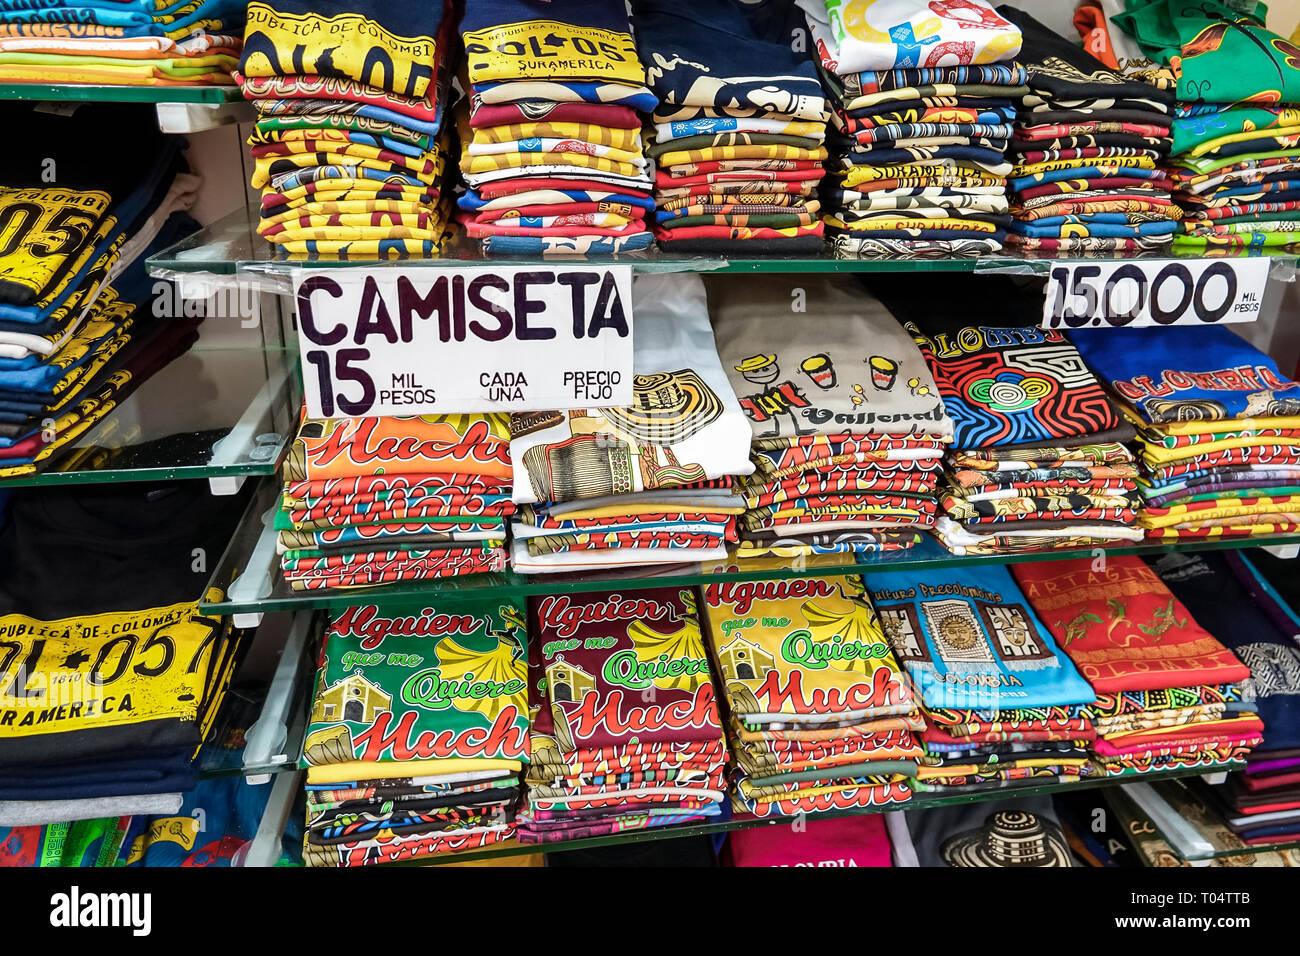 Cartagena Colombia Old Walled City Center centre Centro shopping display sale tee shirts souvenirs Playa de las Bovedas sign price pesos - Stock Image